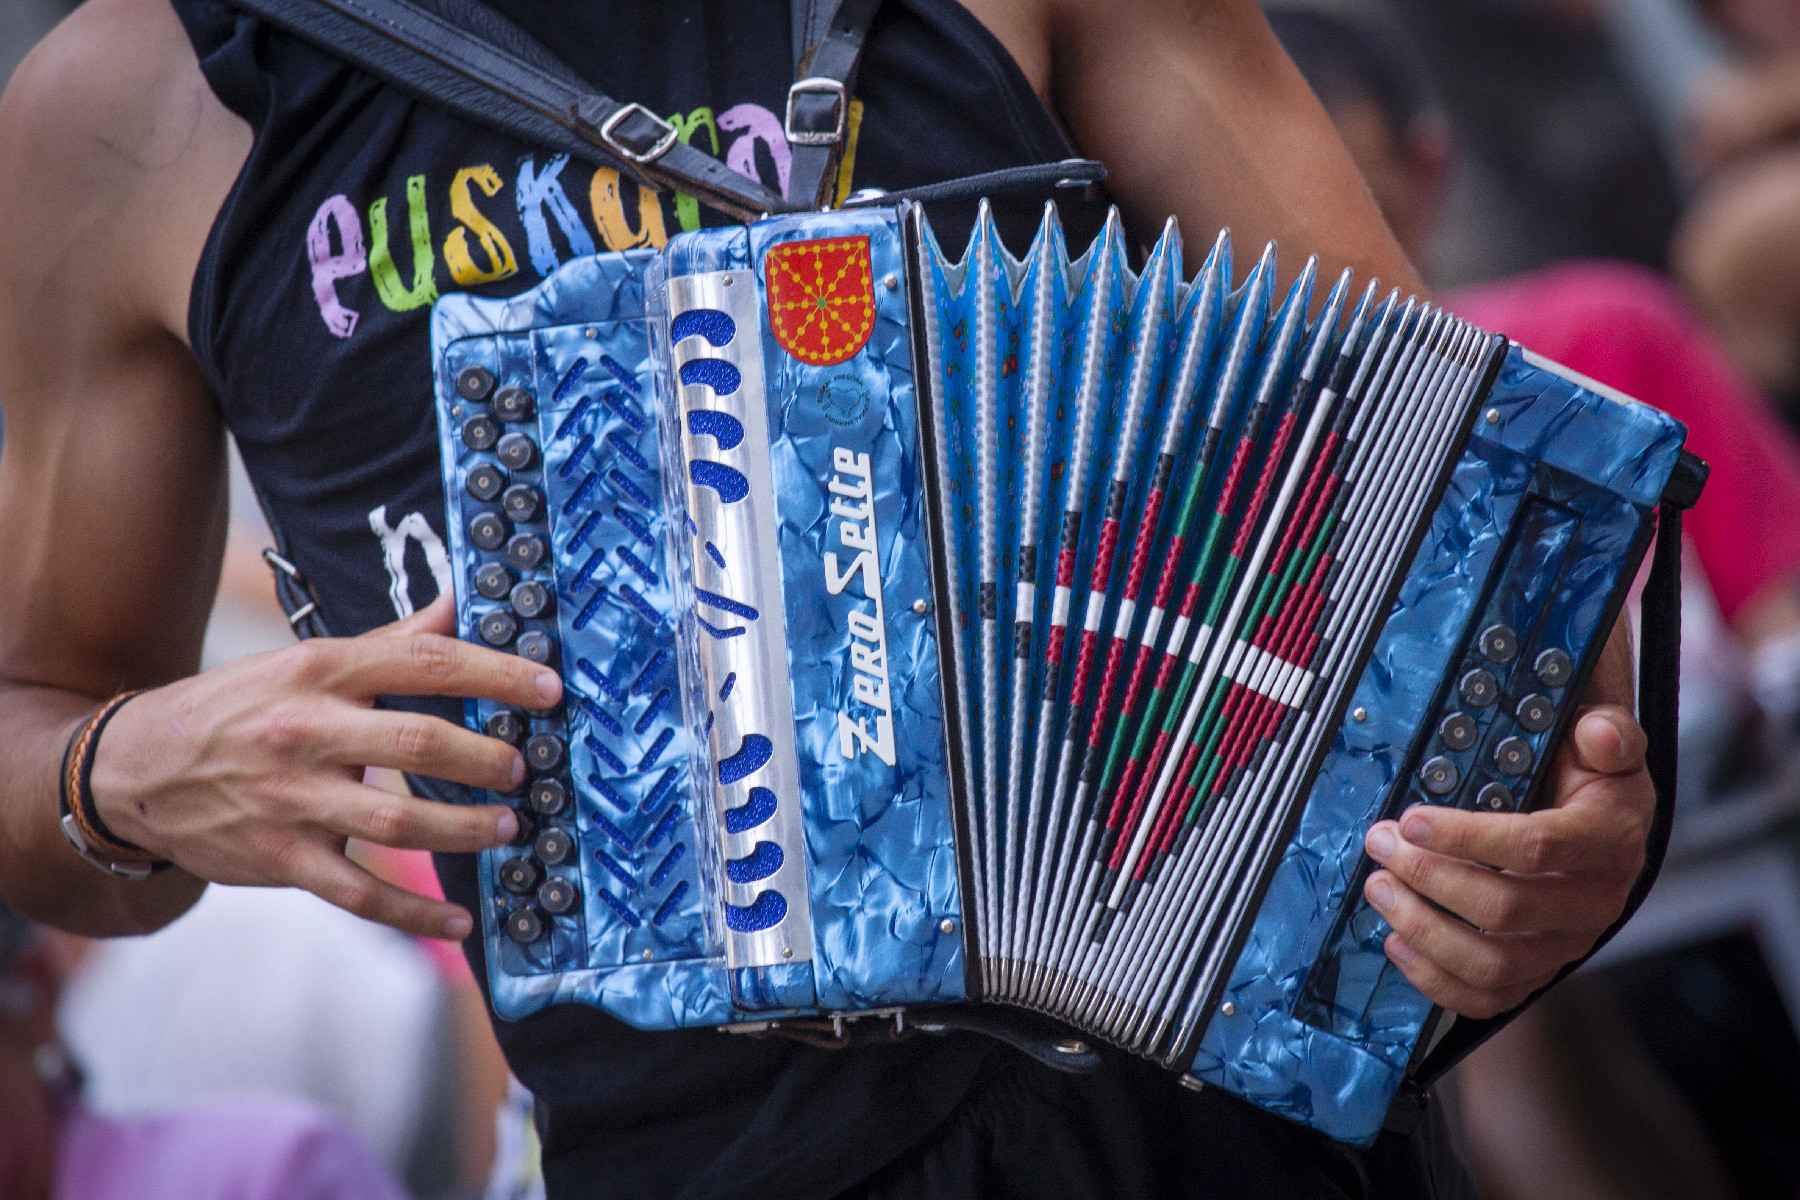 Euskal jaiak or the most popular Basque celebrations